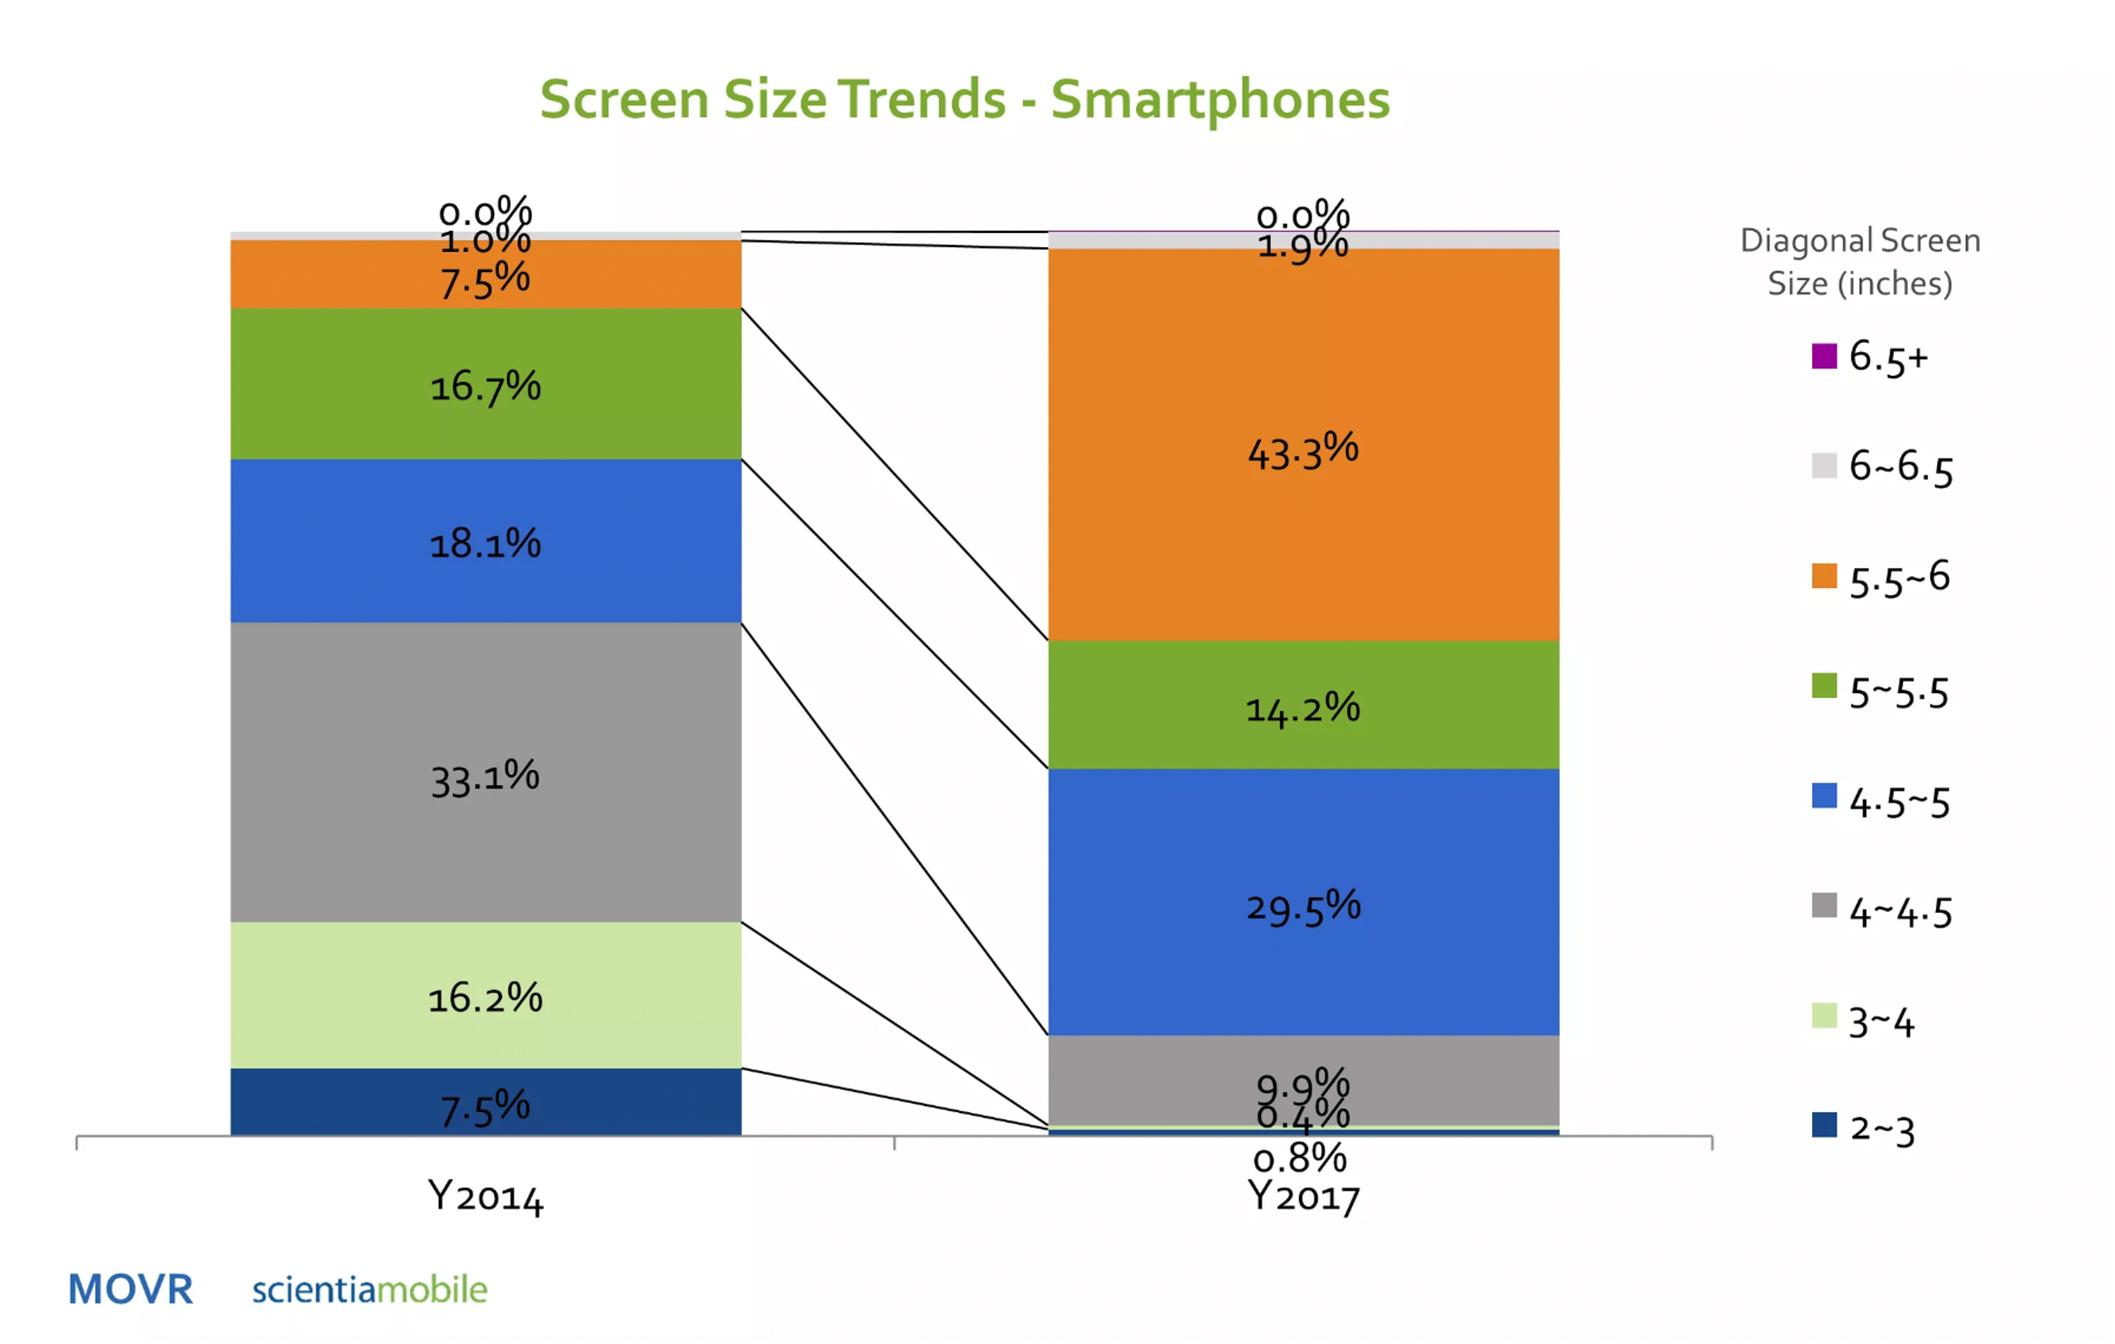 Bottom Navigation Pattern On Mobile Web Pages: A Better Alternative? — Smashing Magazine